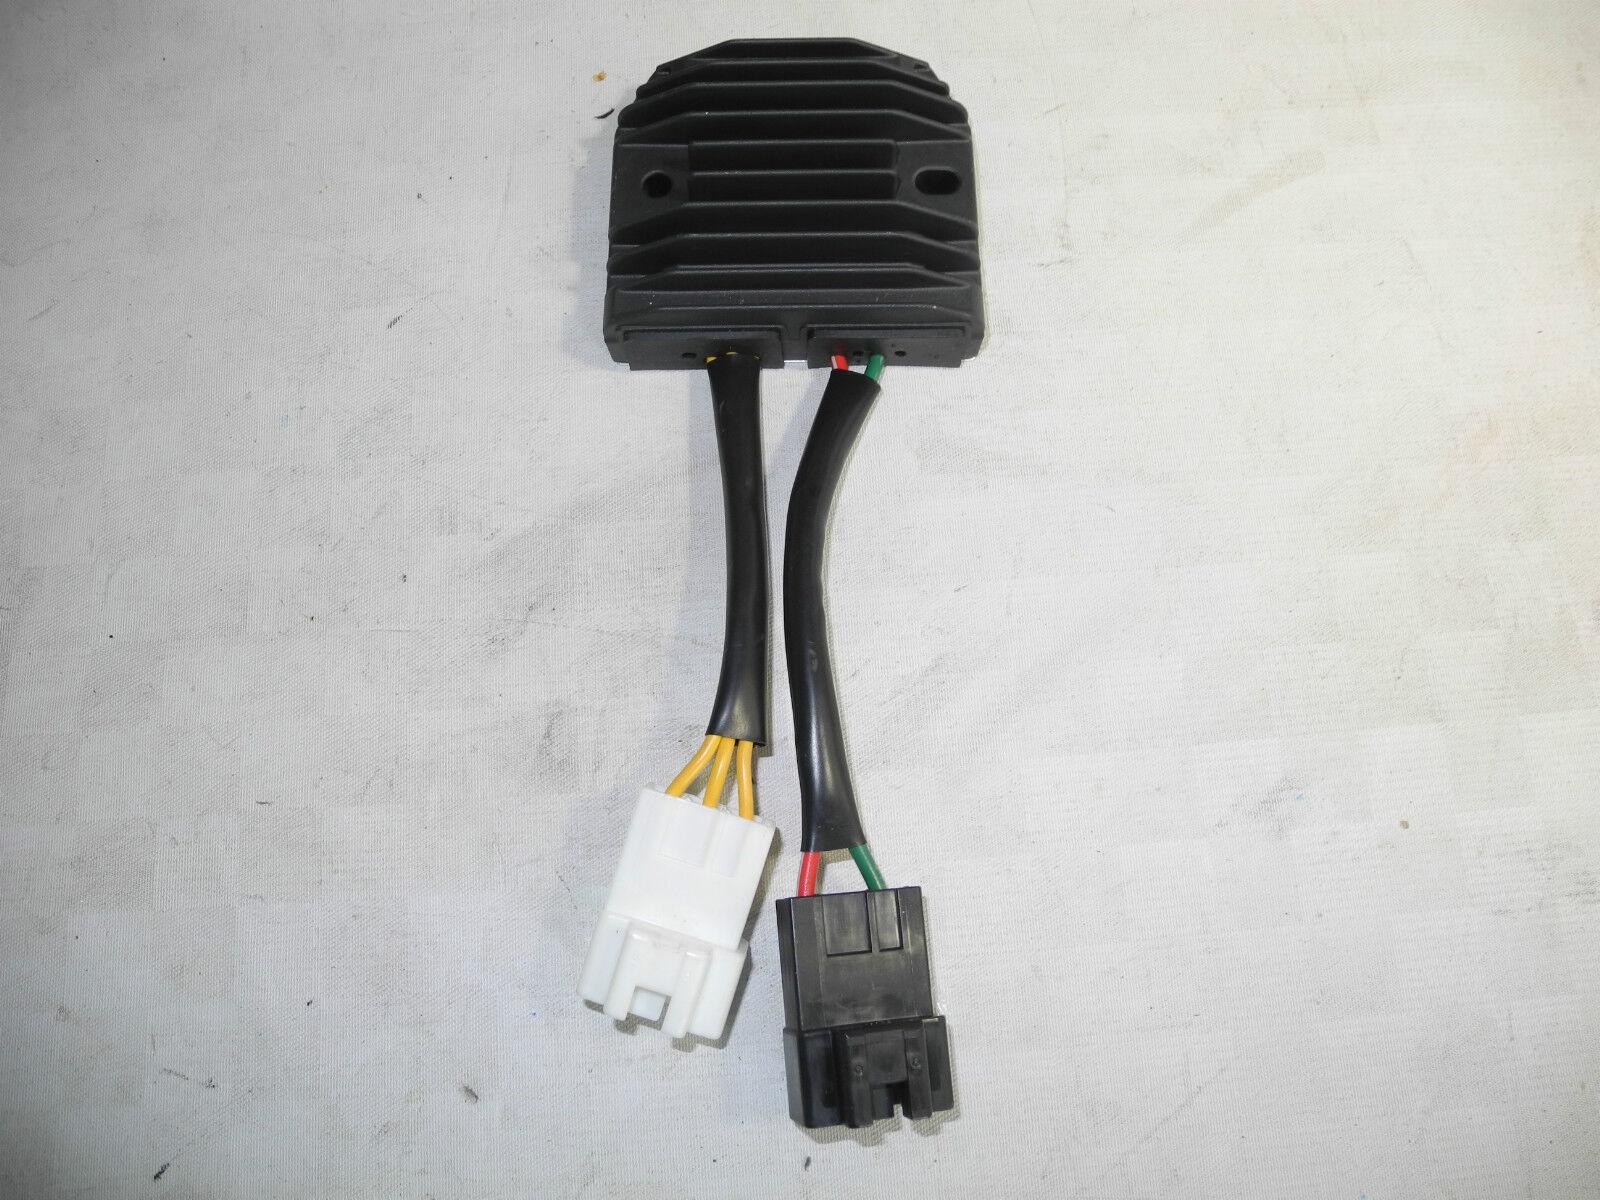 Regulador Rectifier Rectifier Rectifier honda sh300 año 07-10 New Part bulbos 2aa1fa